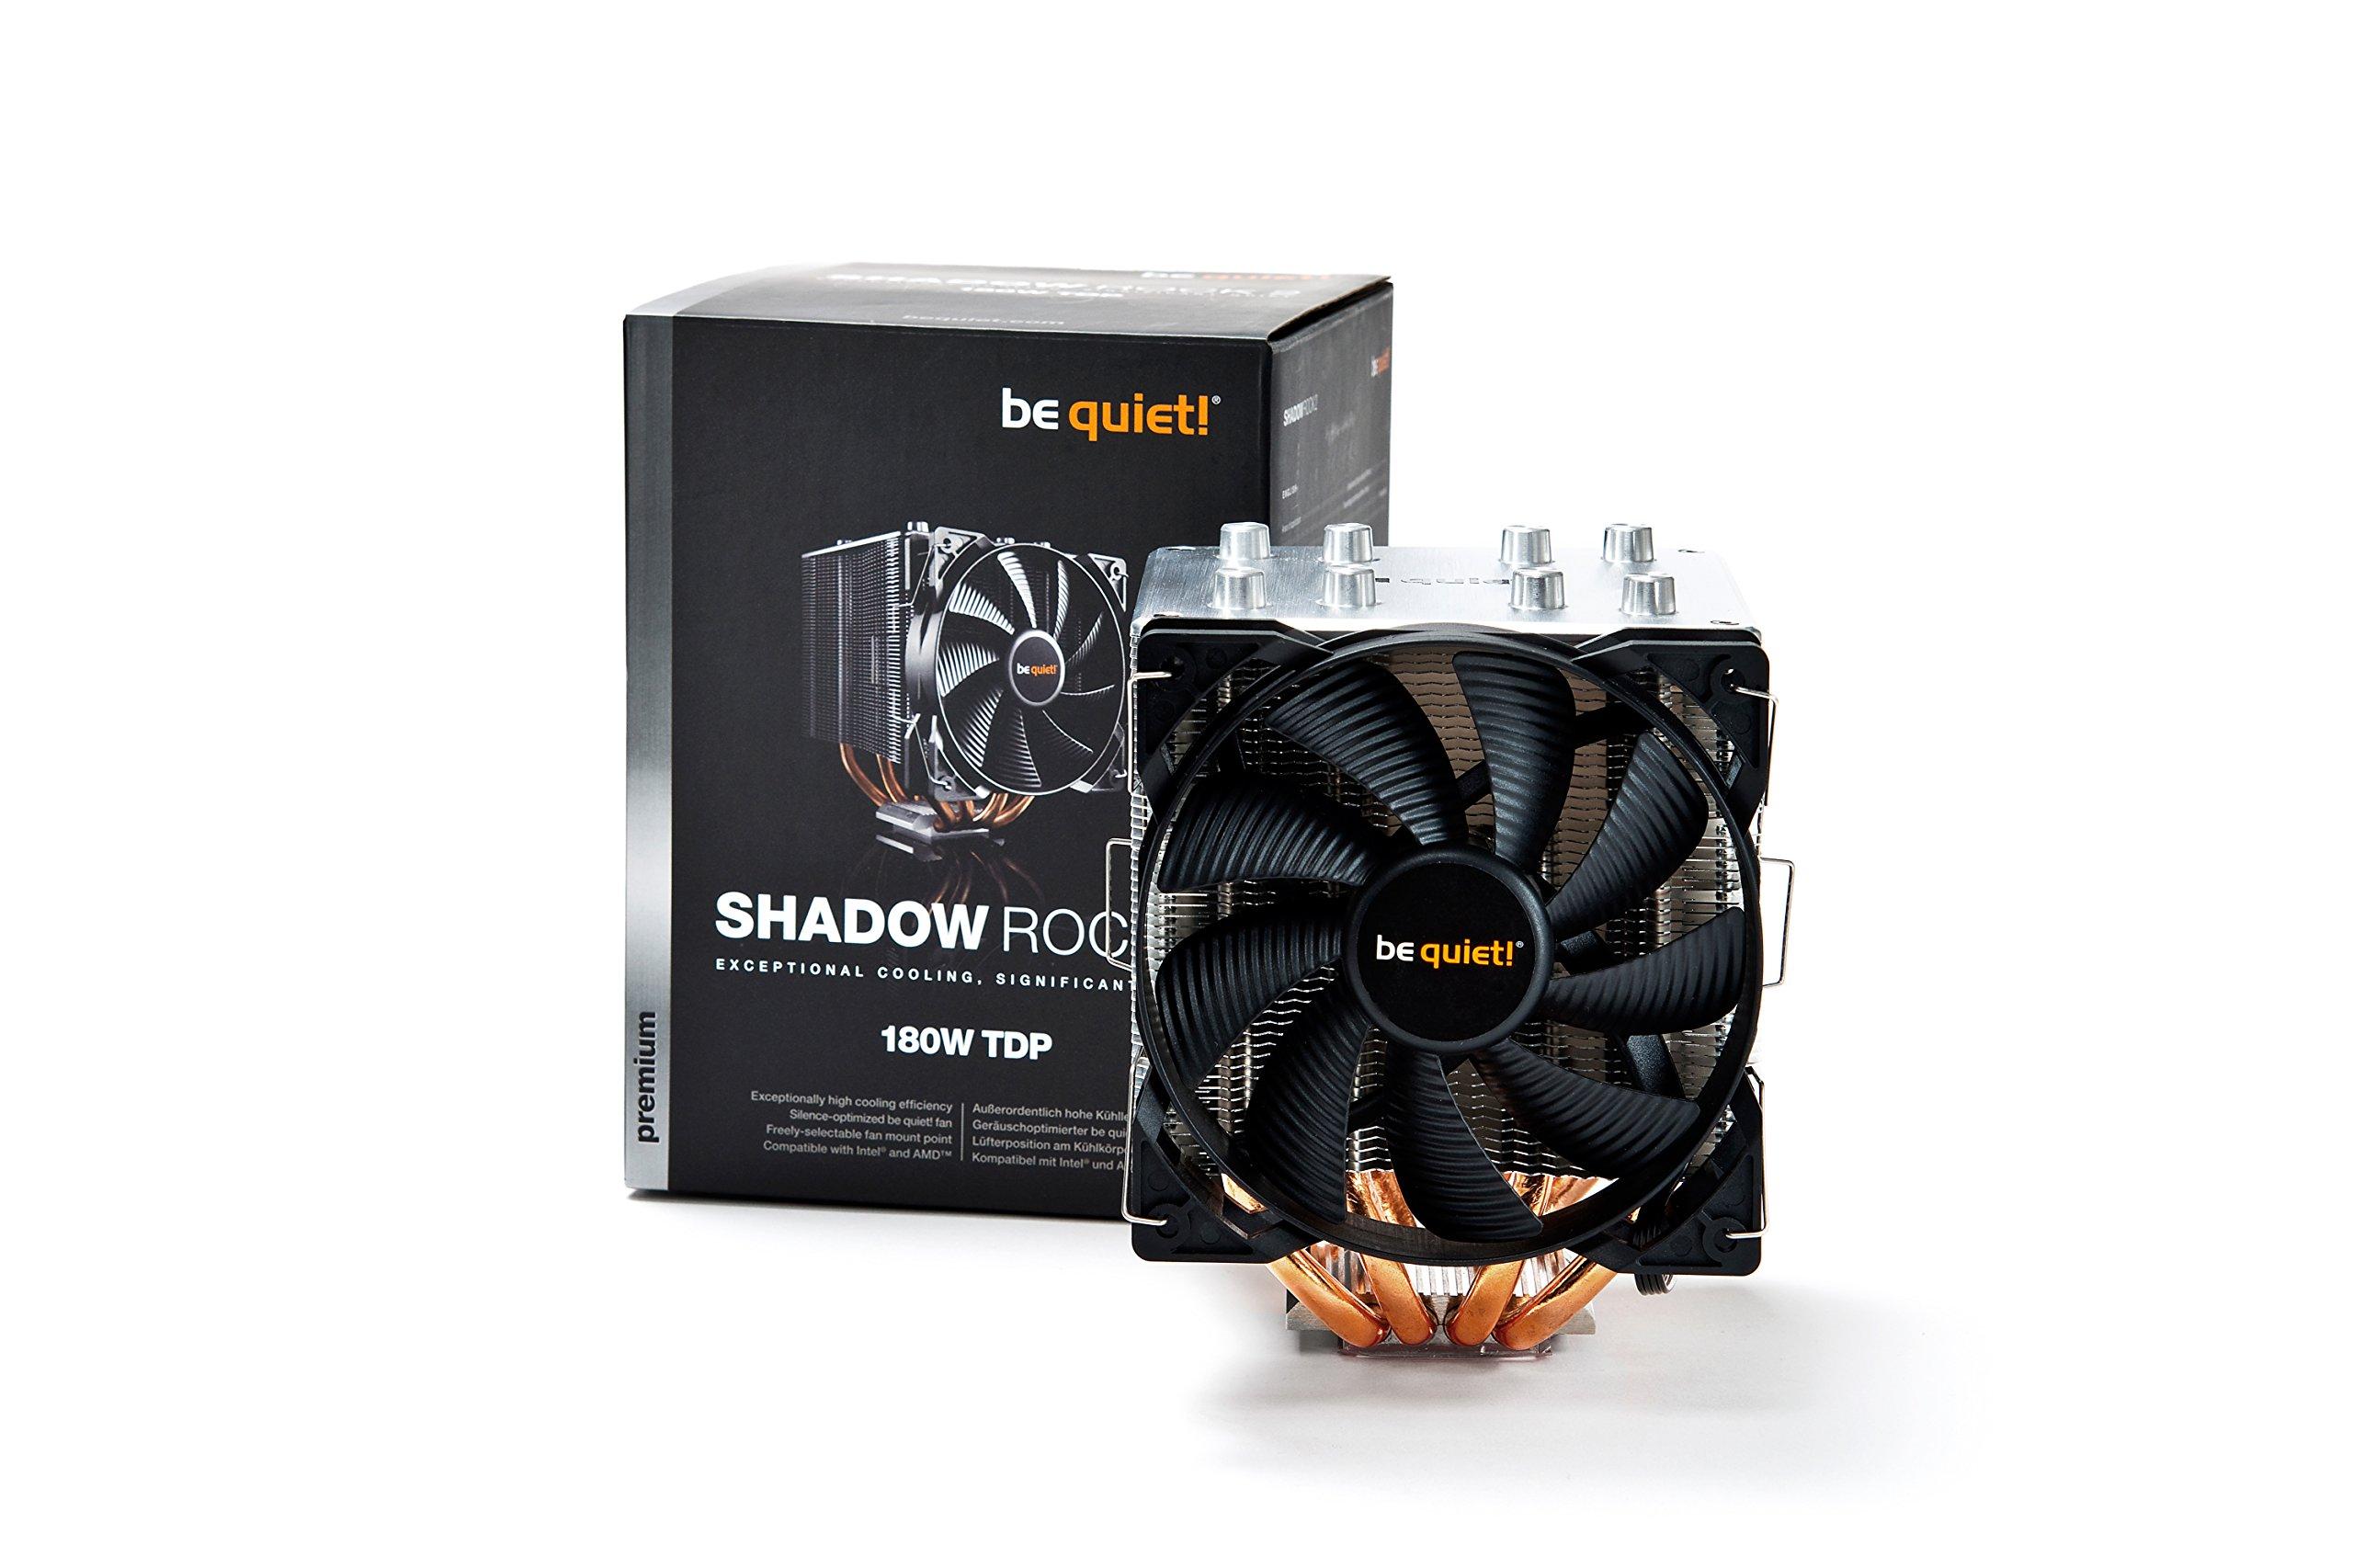 // AM3 be quiet 160W TDP- Intel LGA 775 // 1150 // 1155 // 1156 // 1366 // 2011 /& AMD Socket AM2 BK010 Shadow Rock Slim/ + CPU Cooler + // FM1 // FM2 // 754 // 939 // 940